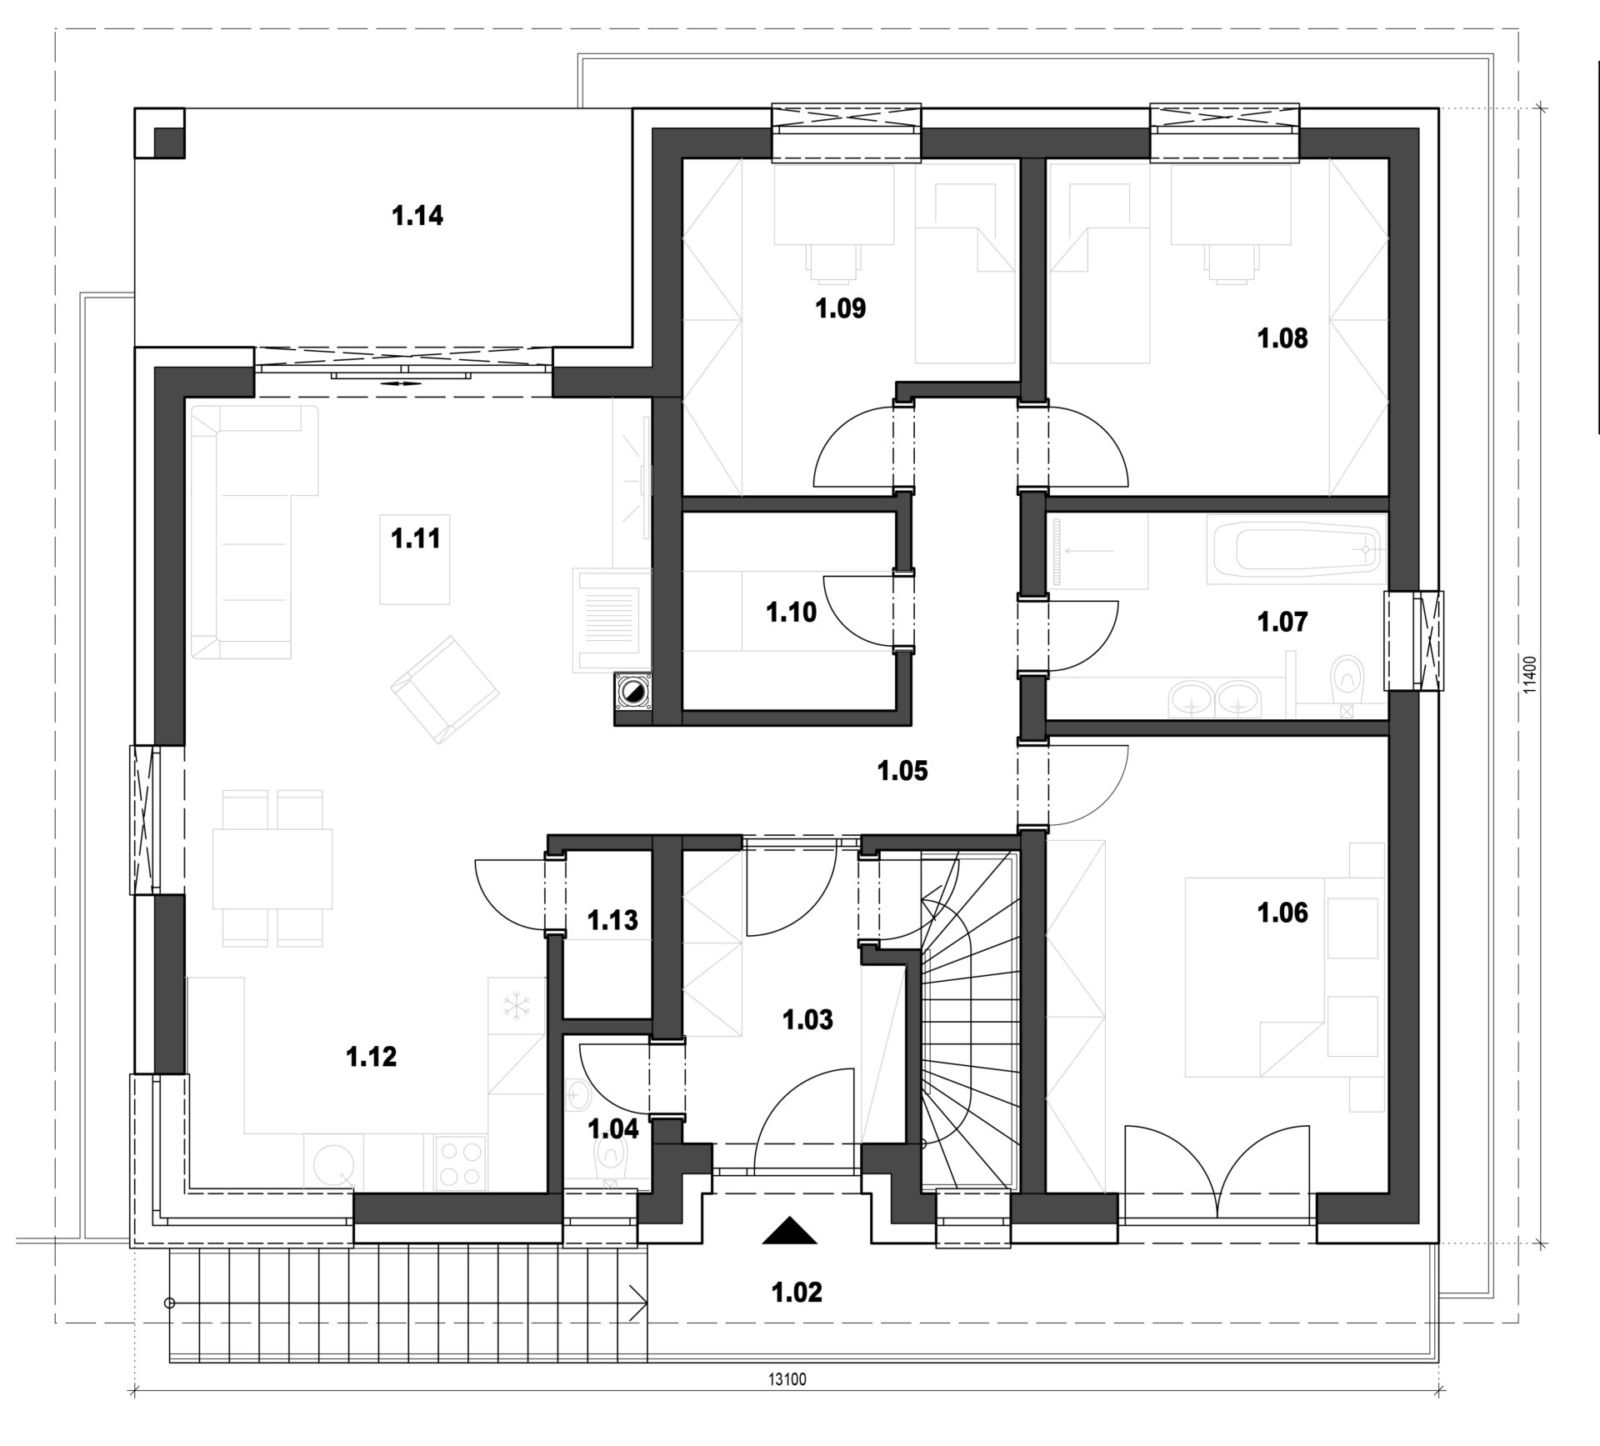 Rodinný dom 4 nadzemne podlažie pôdorys